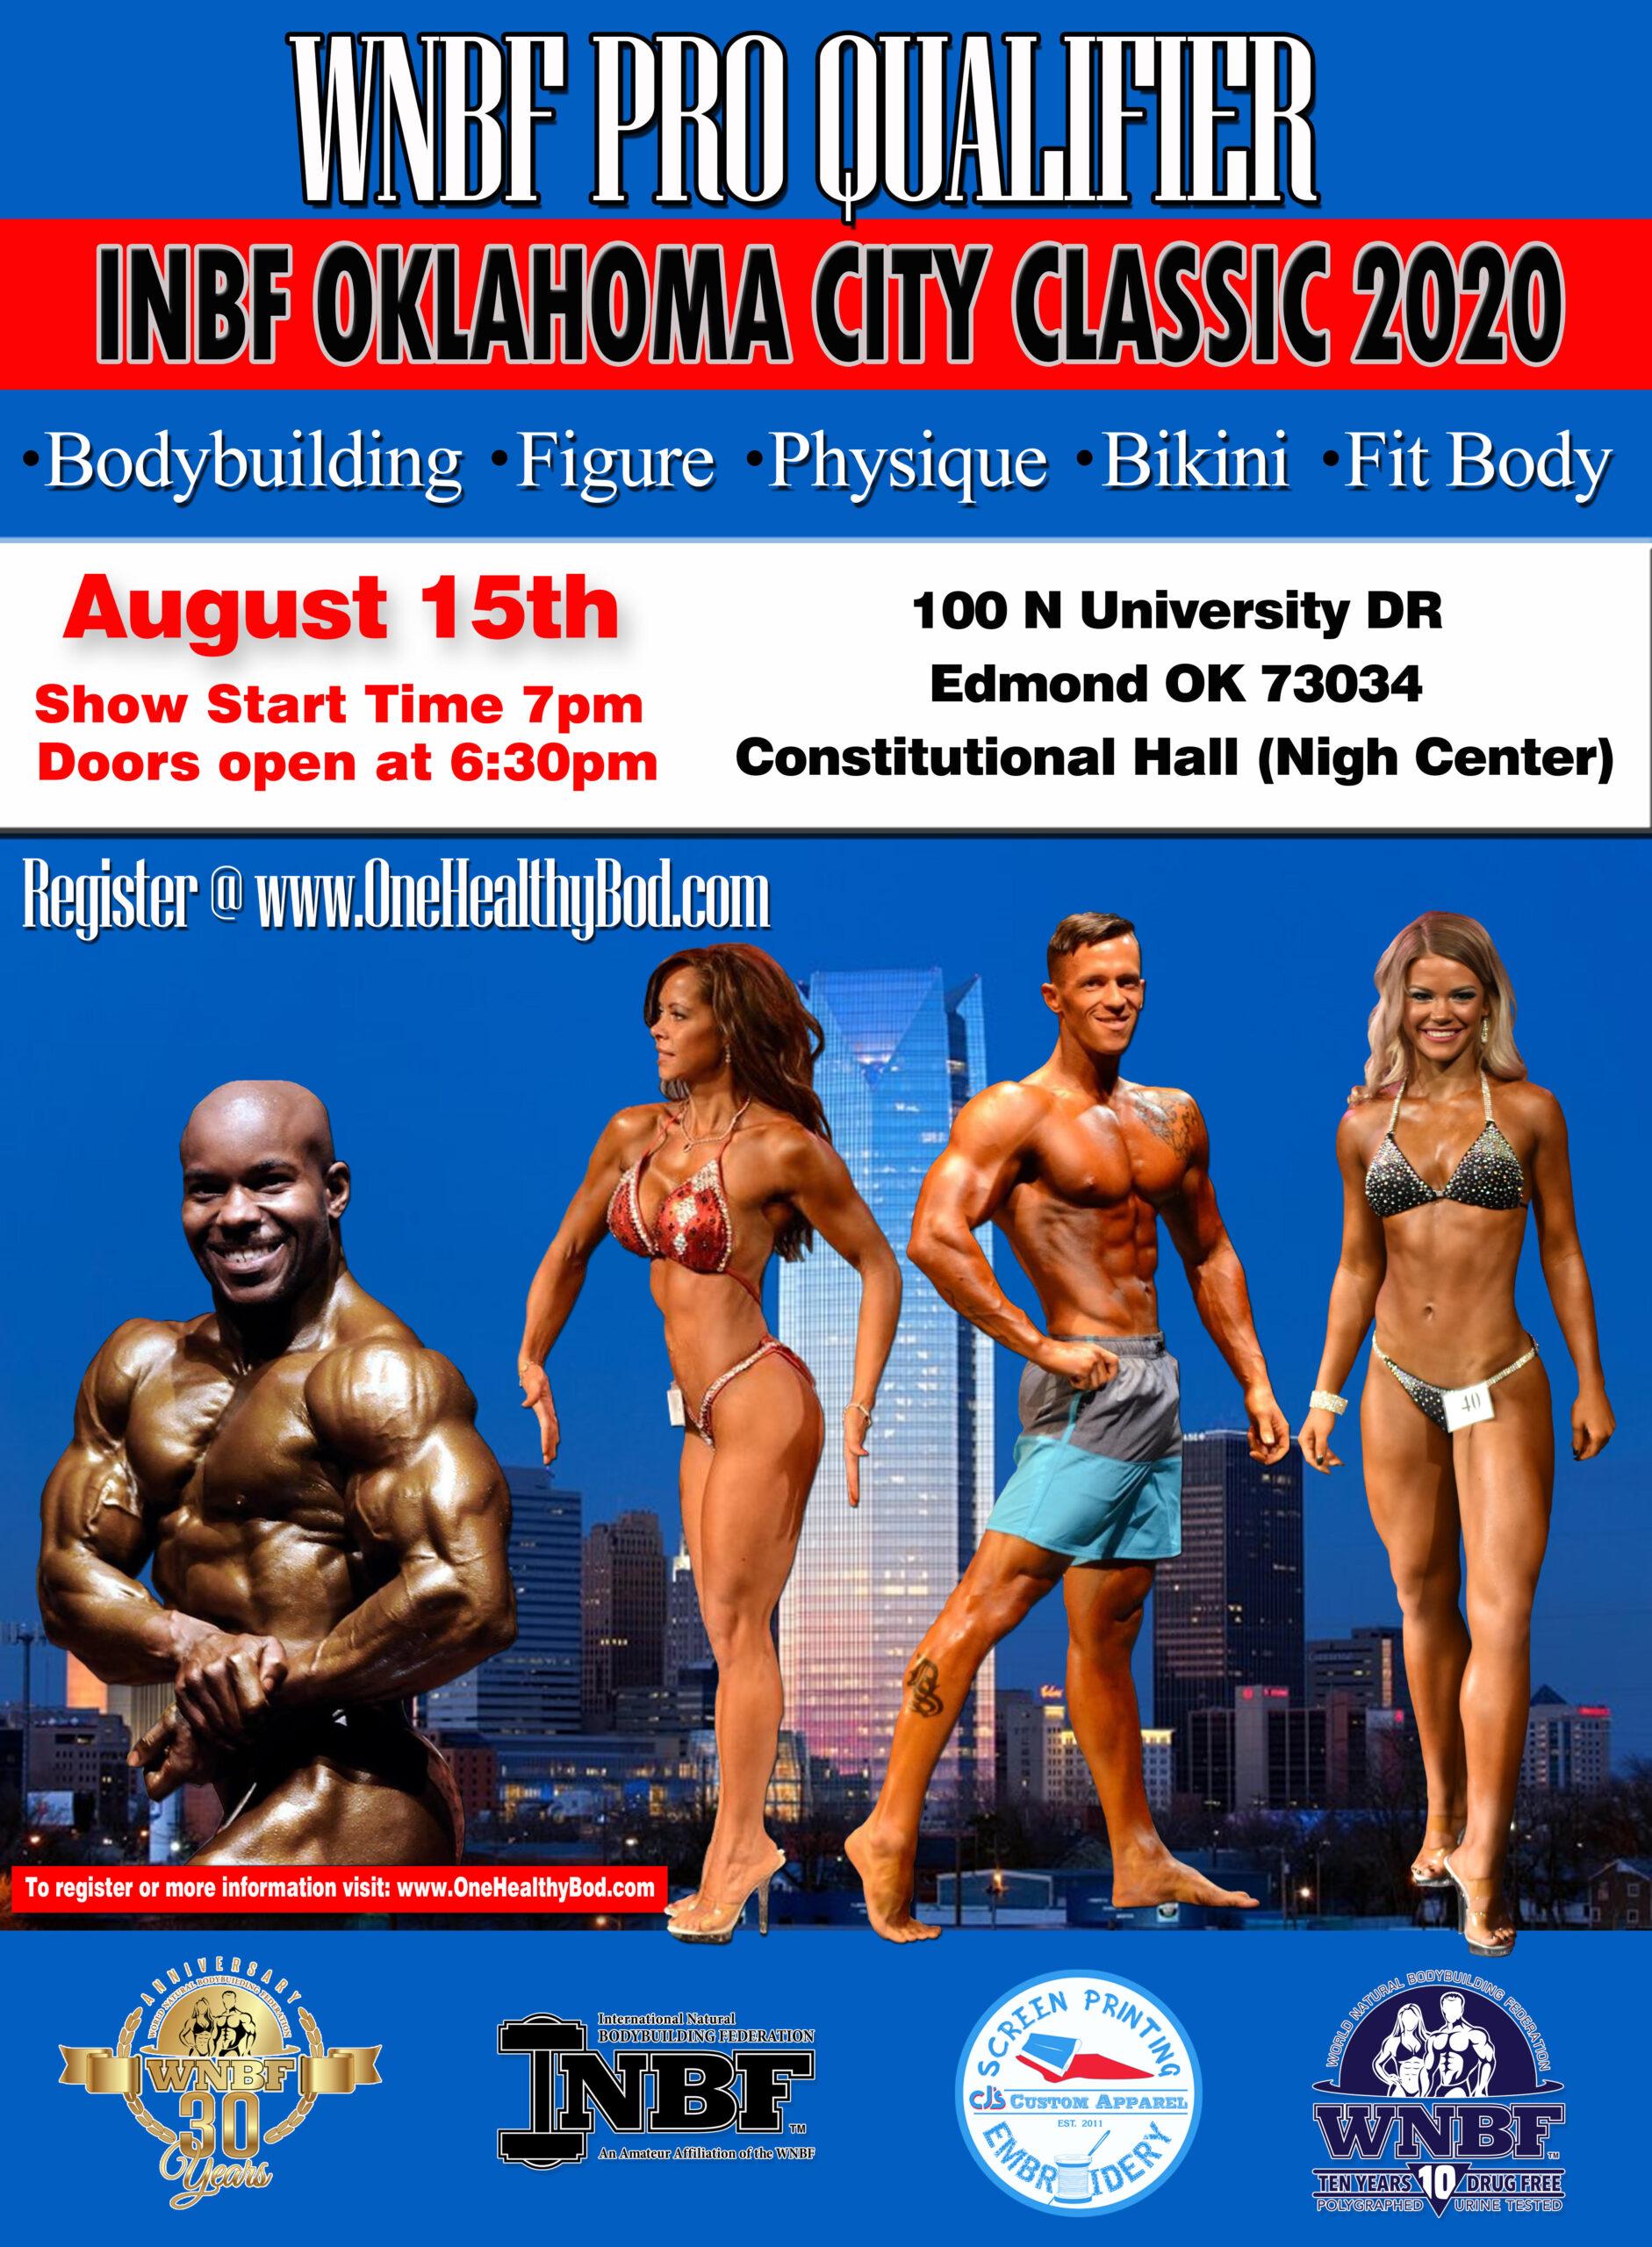 OKC Classic 2020 Poster